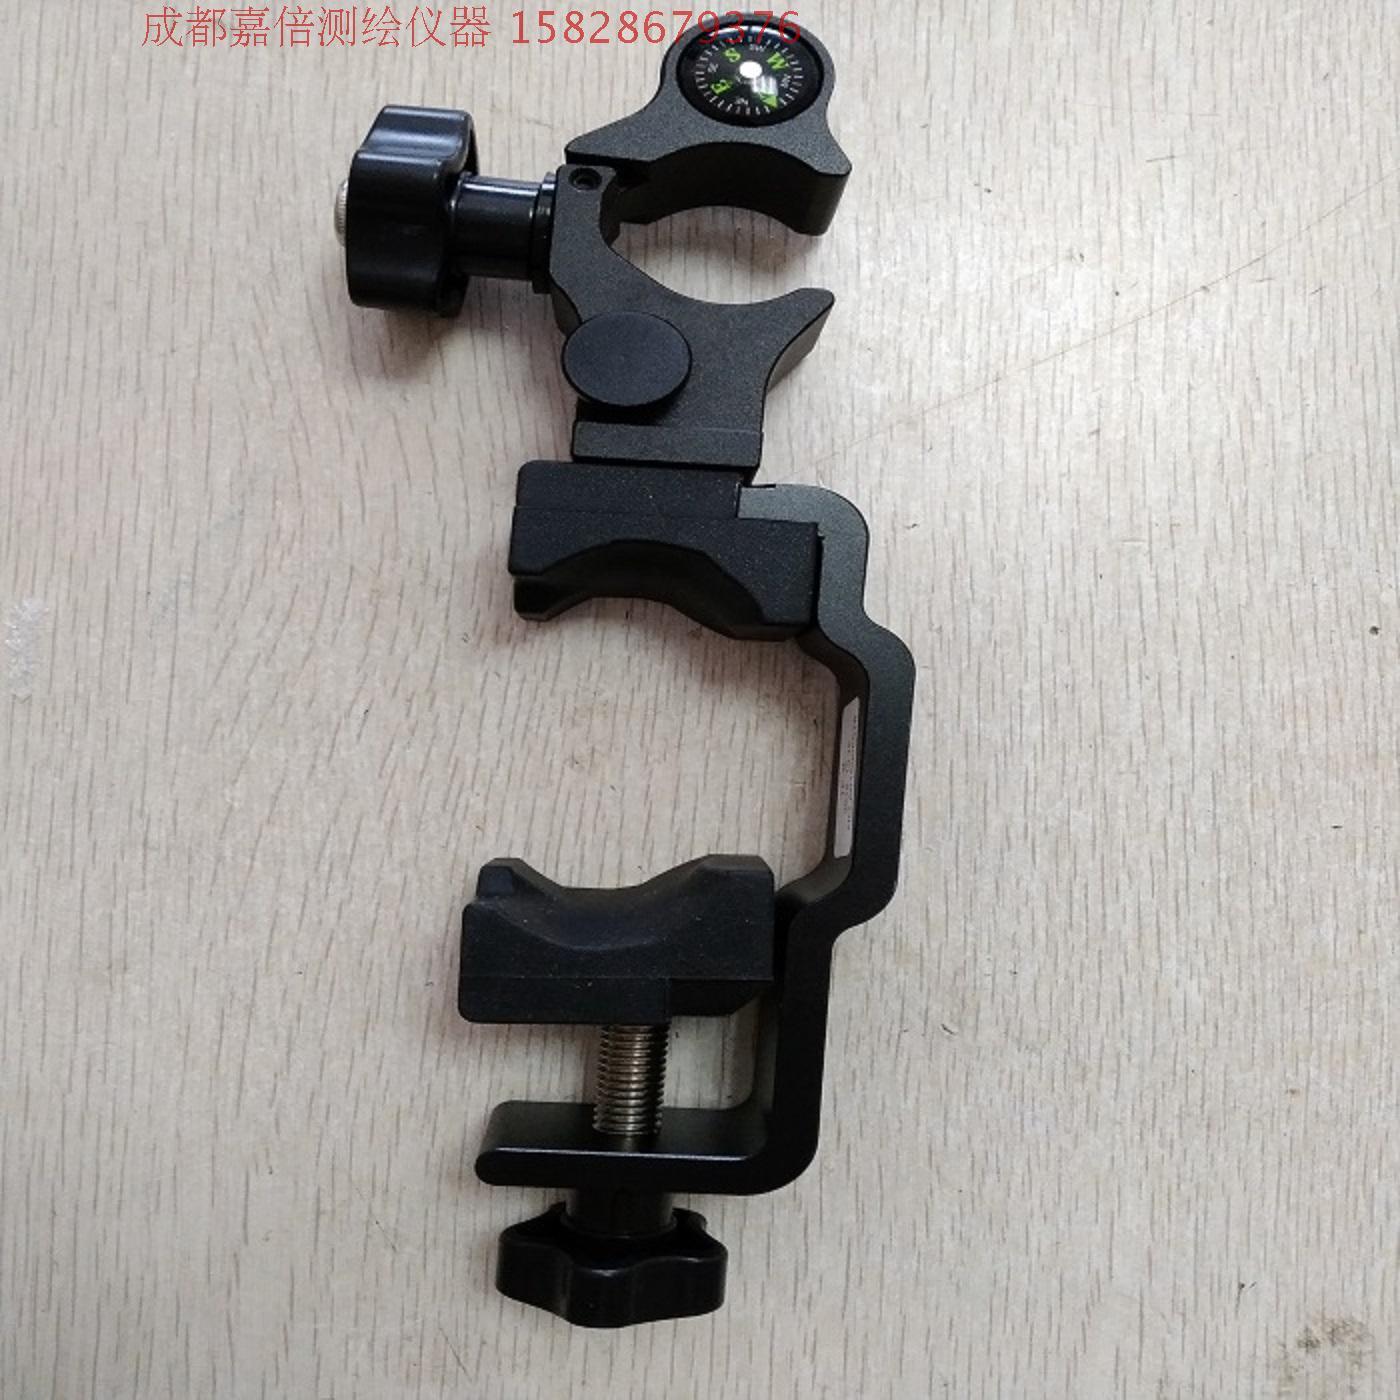 South s730 hand book bracket x3 hand book China haida GPS hand book bracket